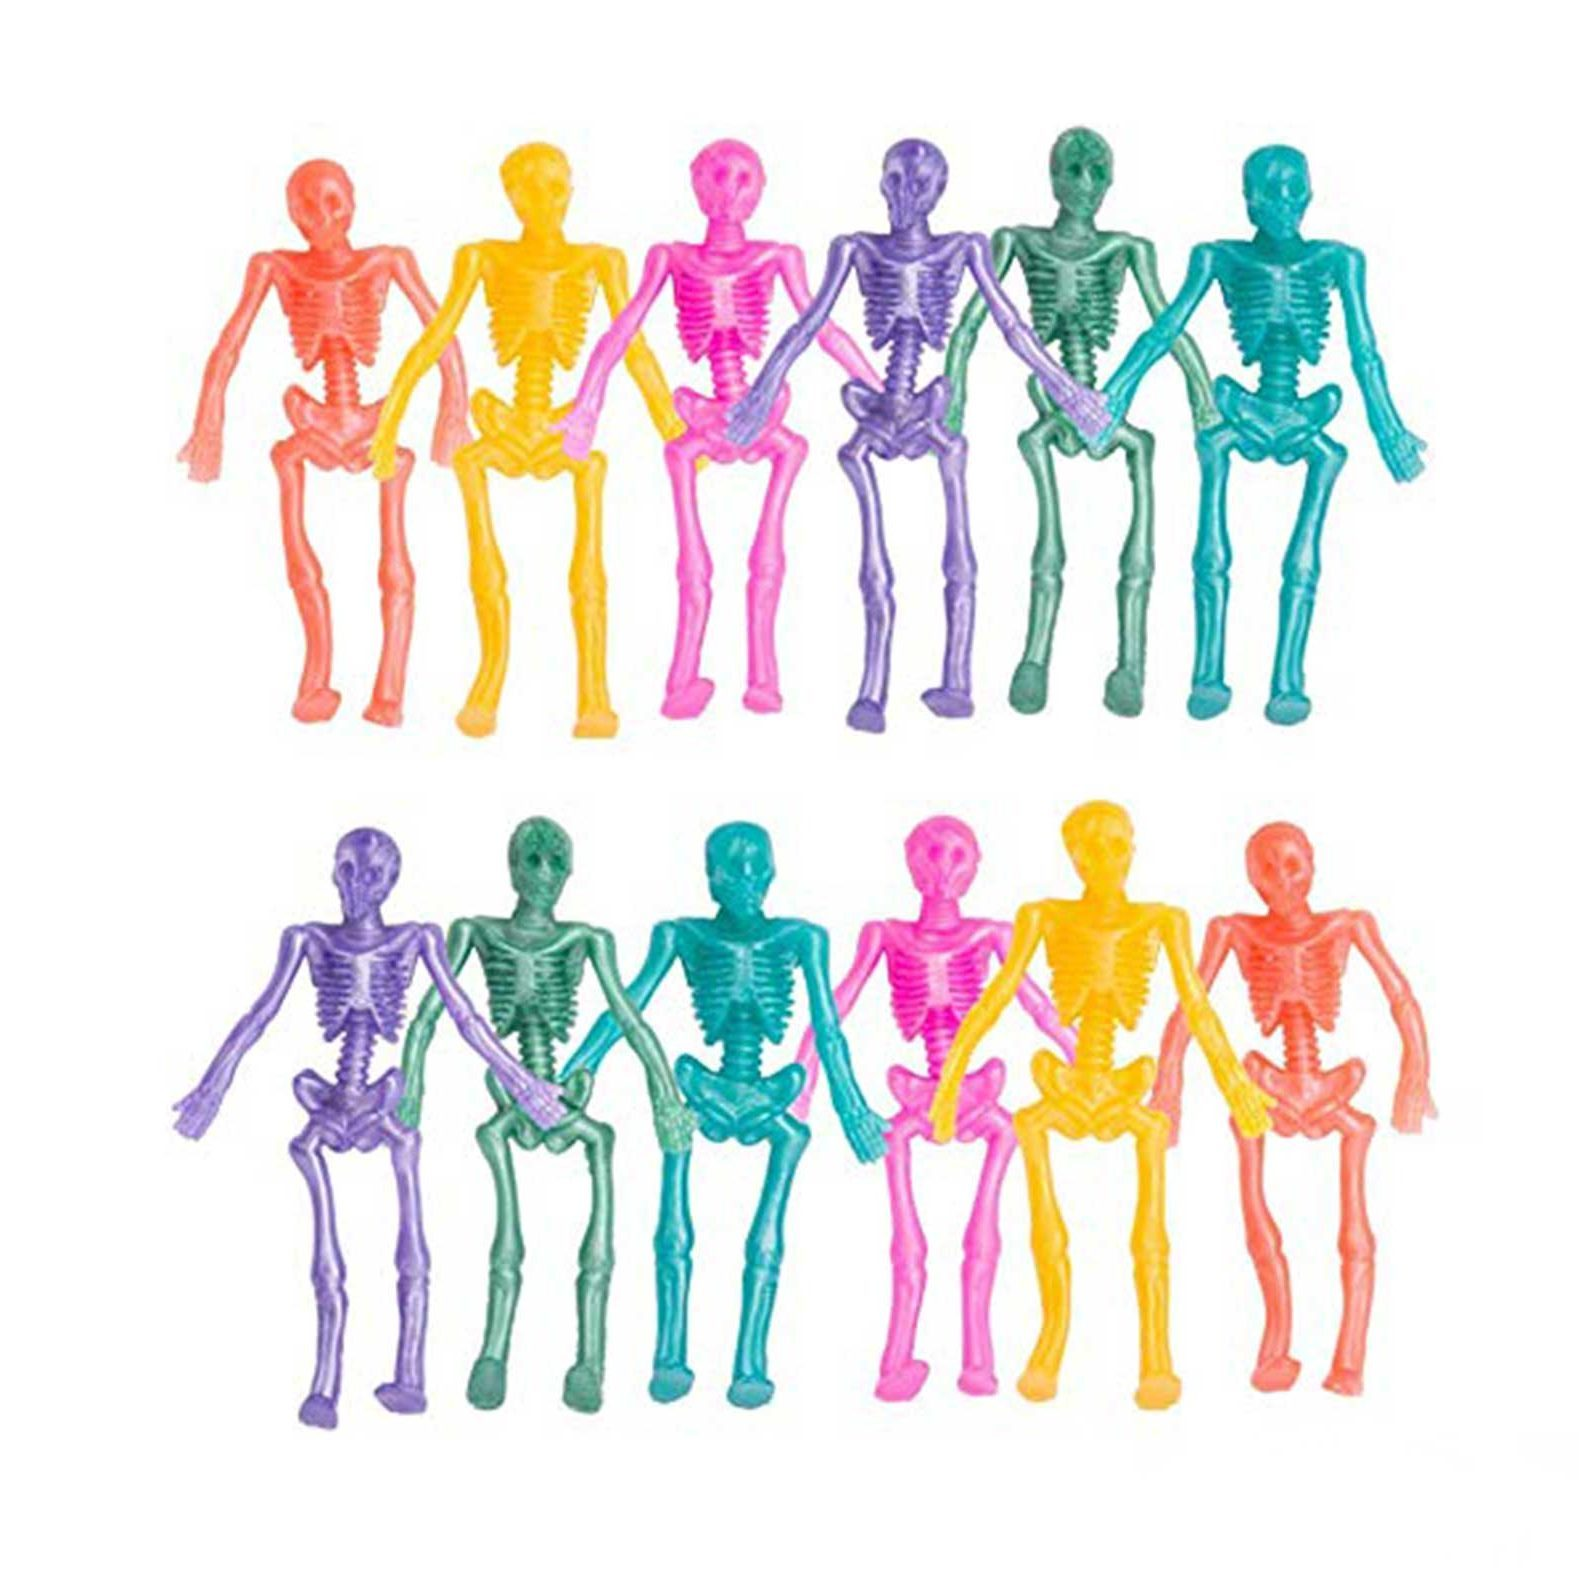 14_Stretchy-skeletons